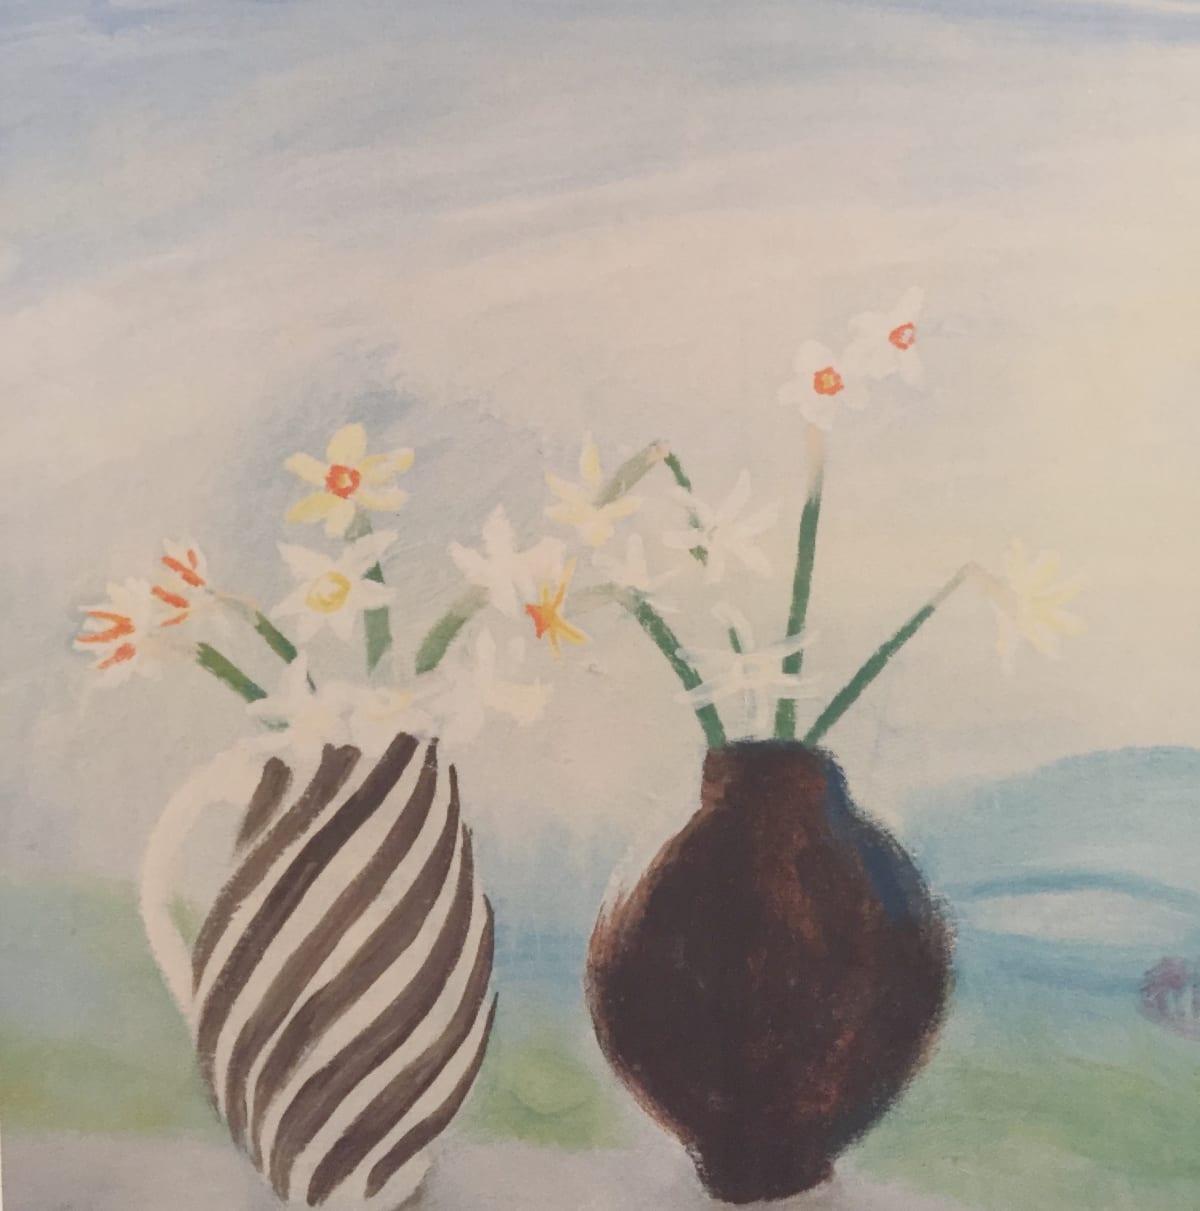 Winifred NICHOLSON (1893 – 1981) Narcissi, 1979 Oil on board 24 x 24 inches / 61 x 61 cm